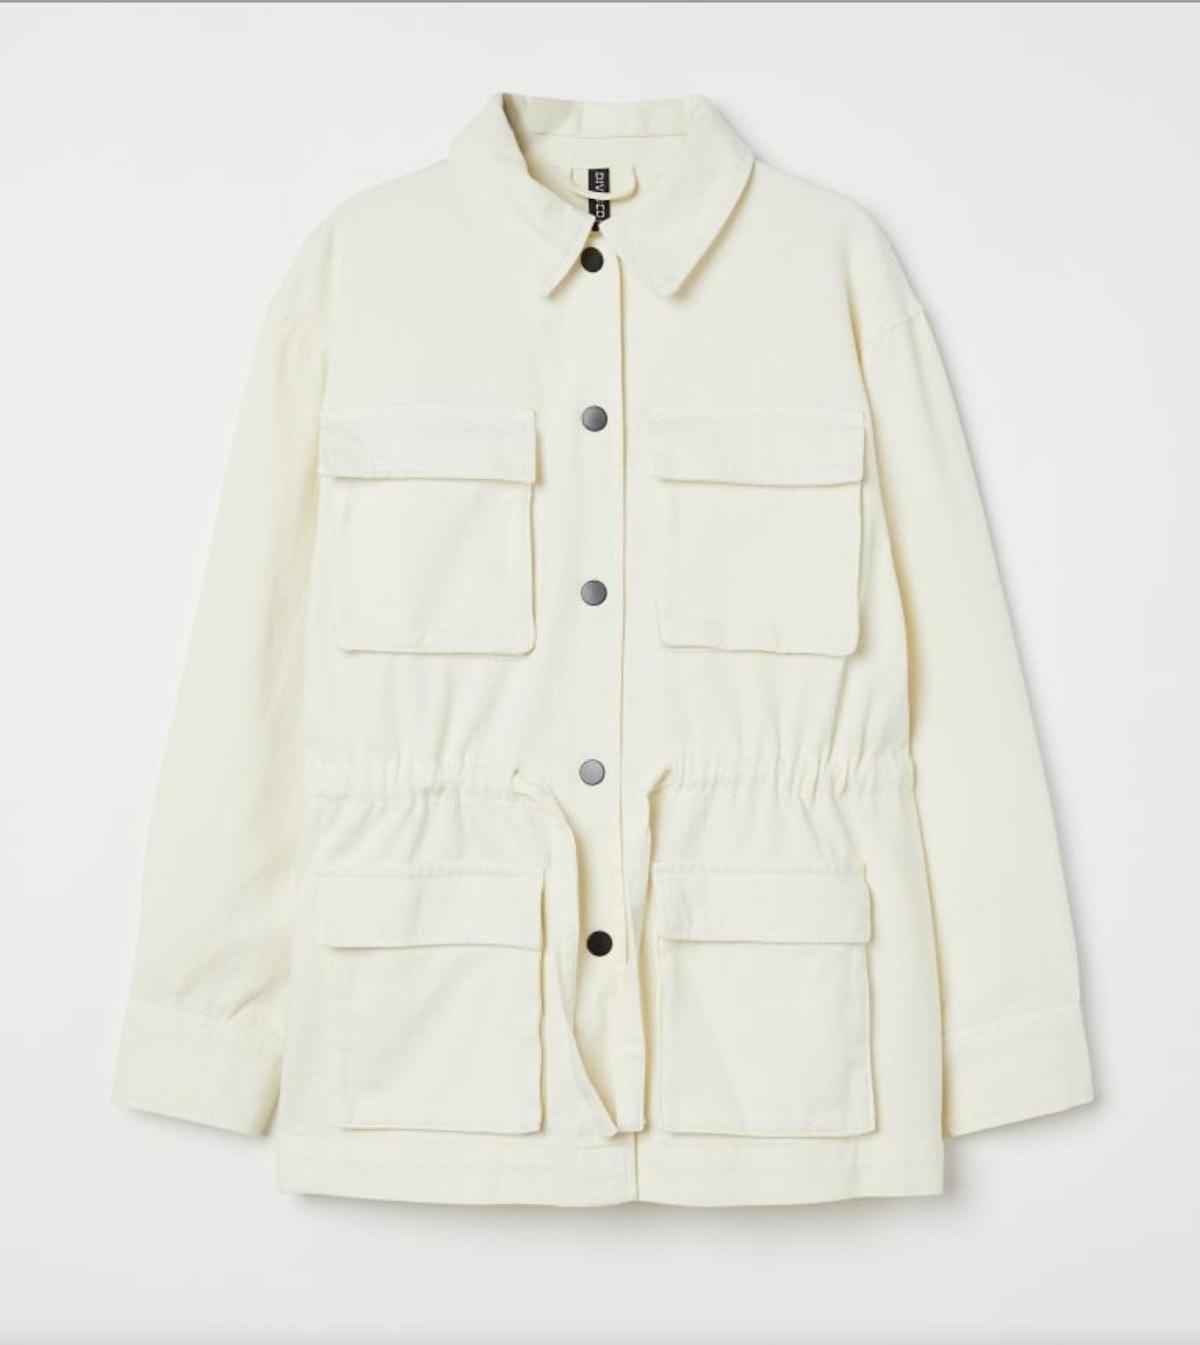 H&M Cotton Twill Utility Jacket.